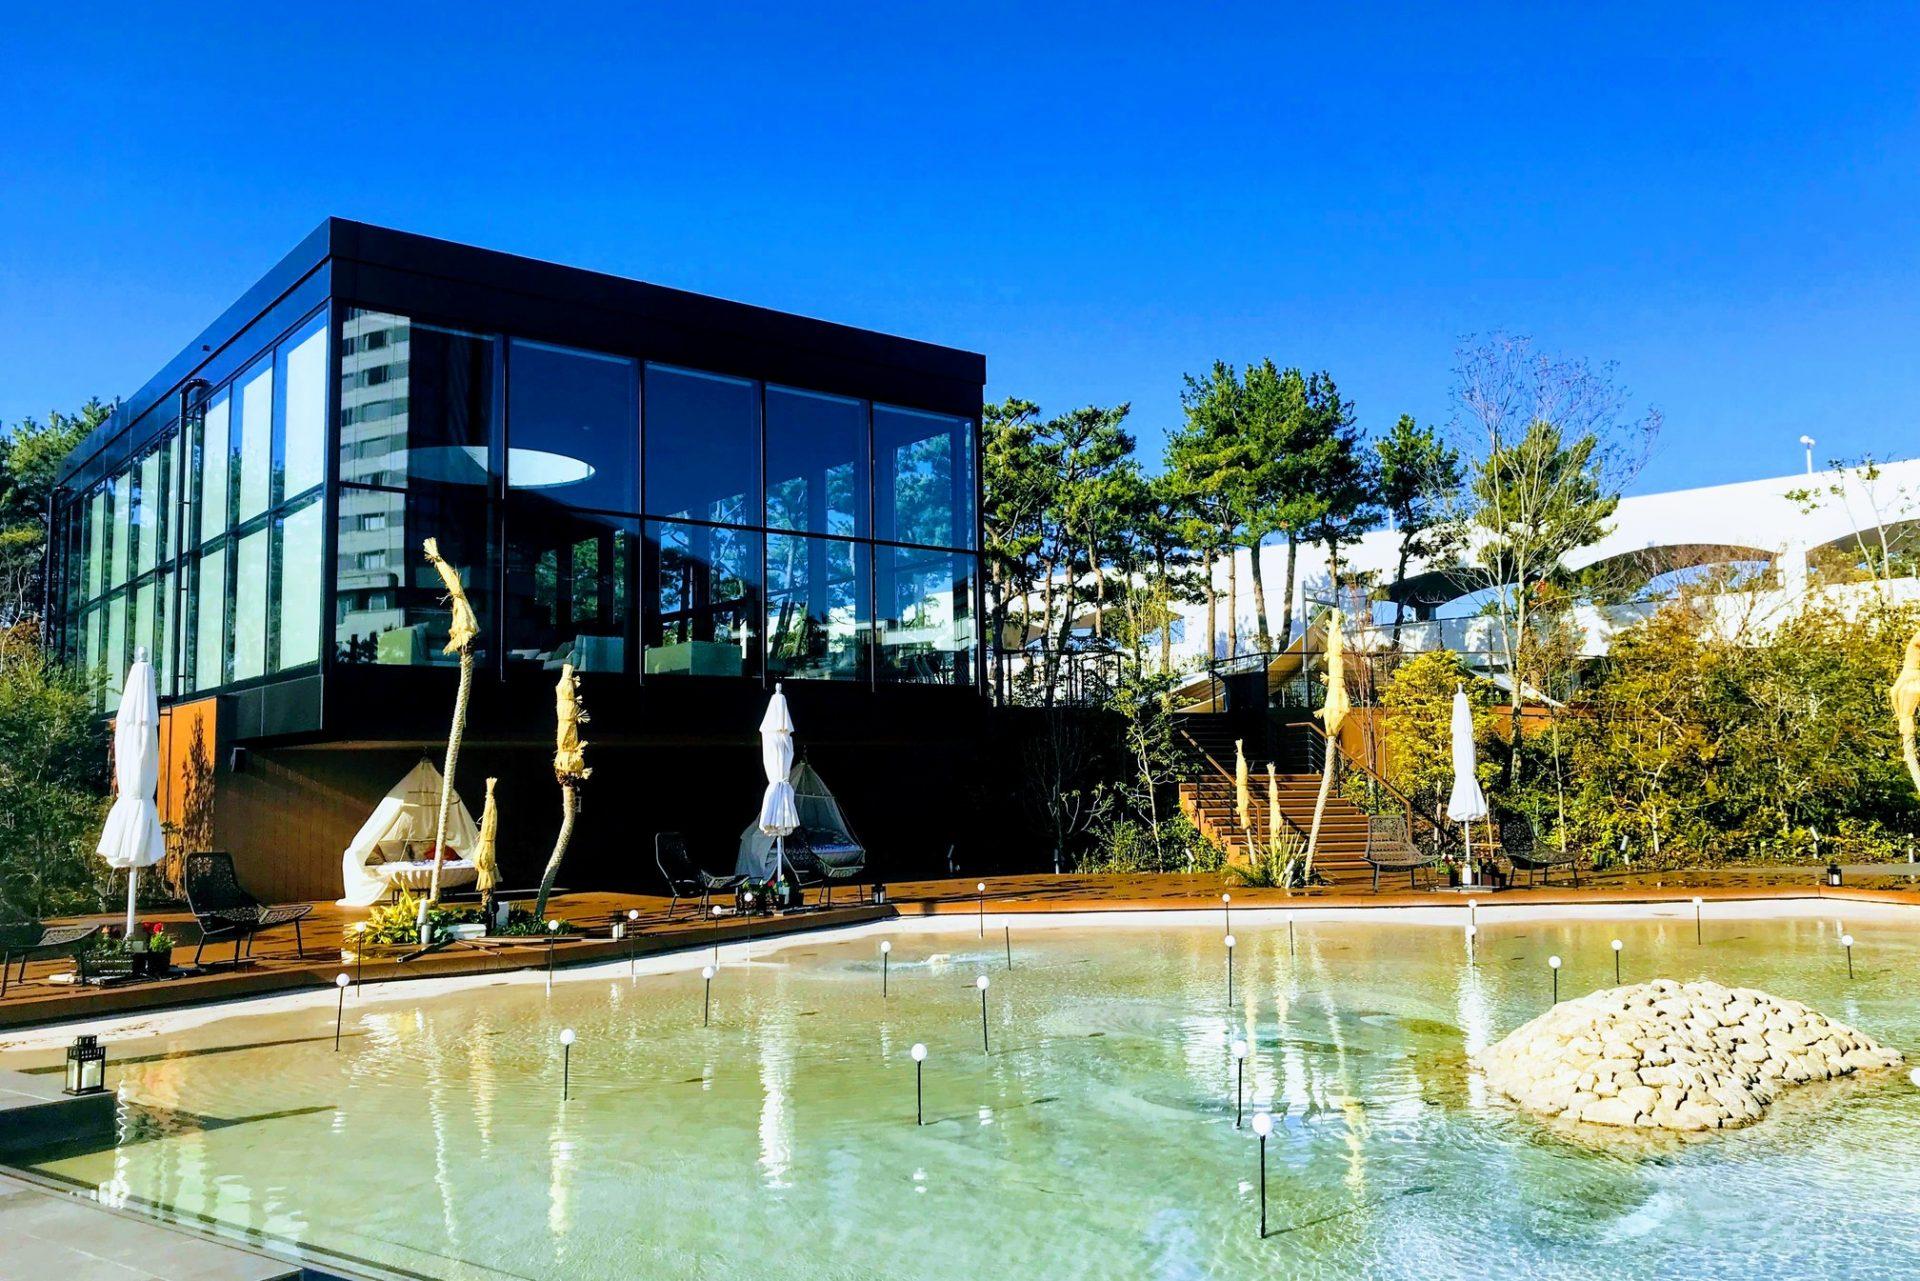 THE LIVING GARDEN シェラトン・グランデ・オーシャンリゾート 宮崎 フェニックス・シーガイア・リゾート